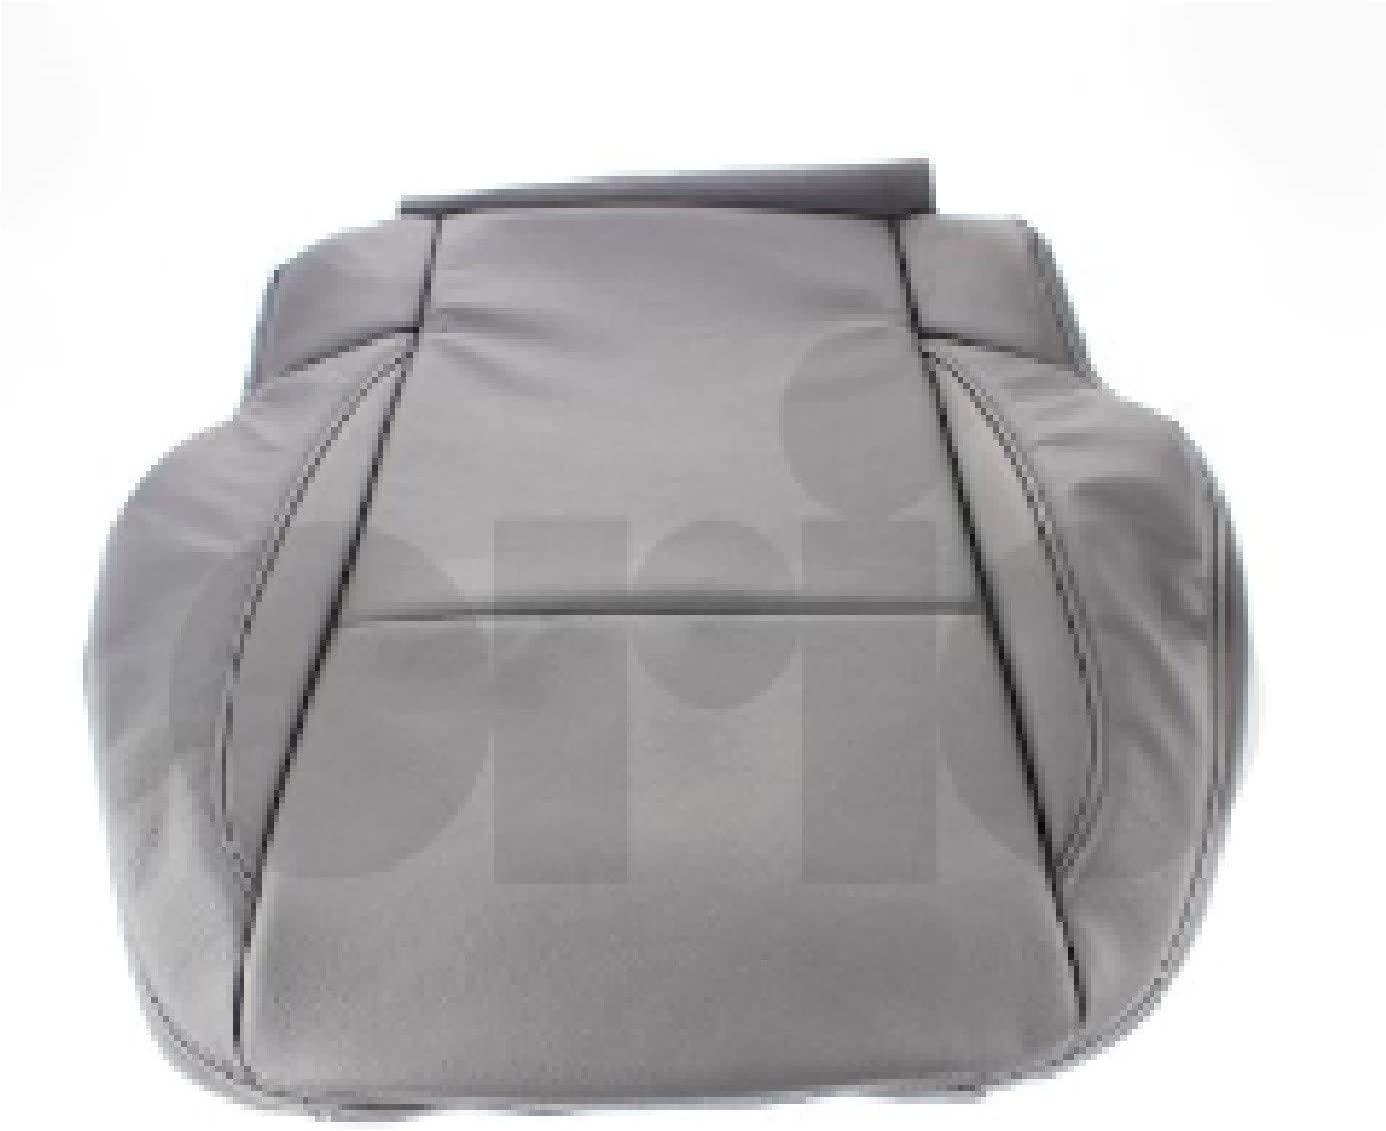 Saab Original 9-3 Left Side Front Seat Cushion Cover - Black 12779351